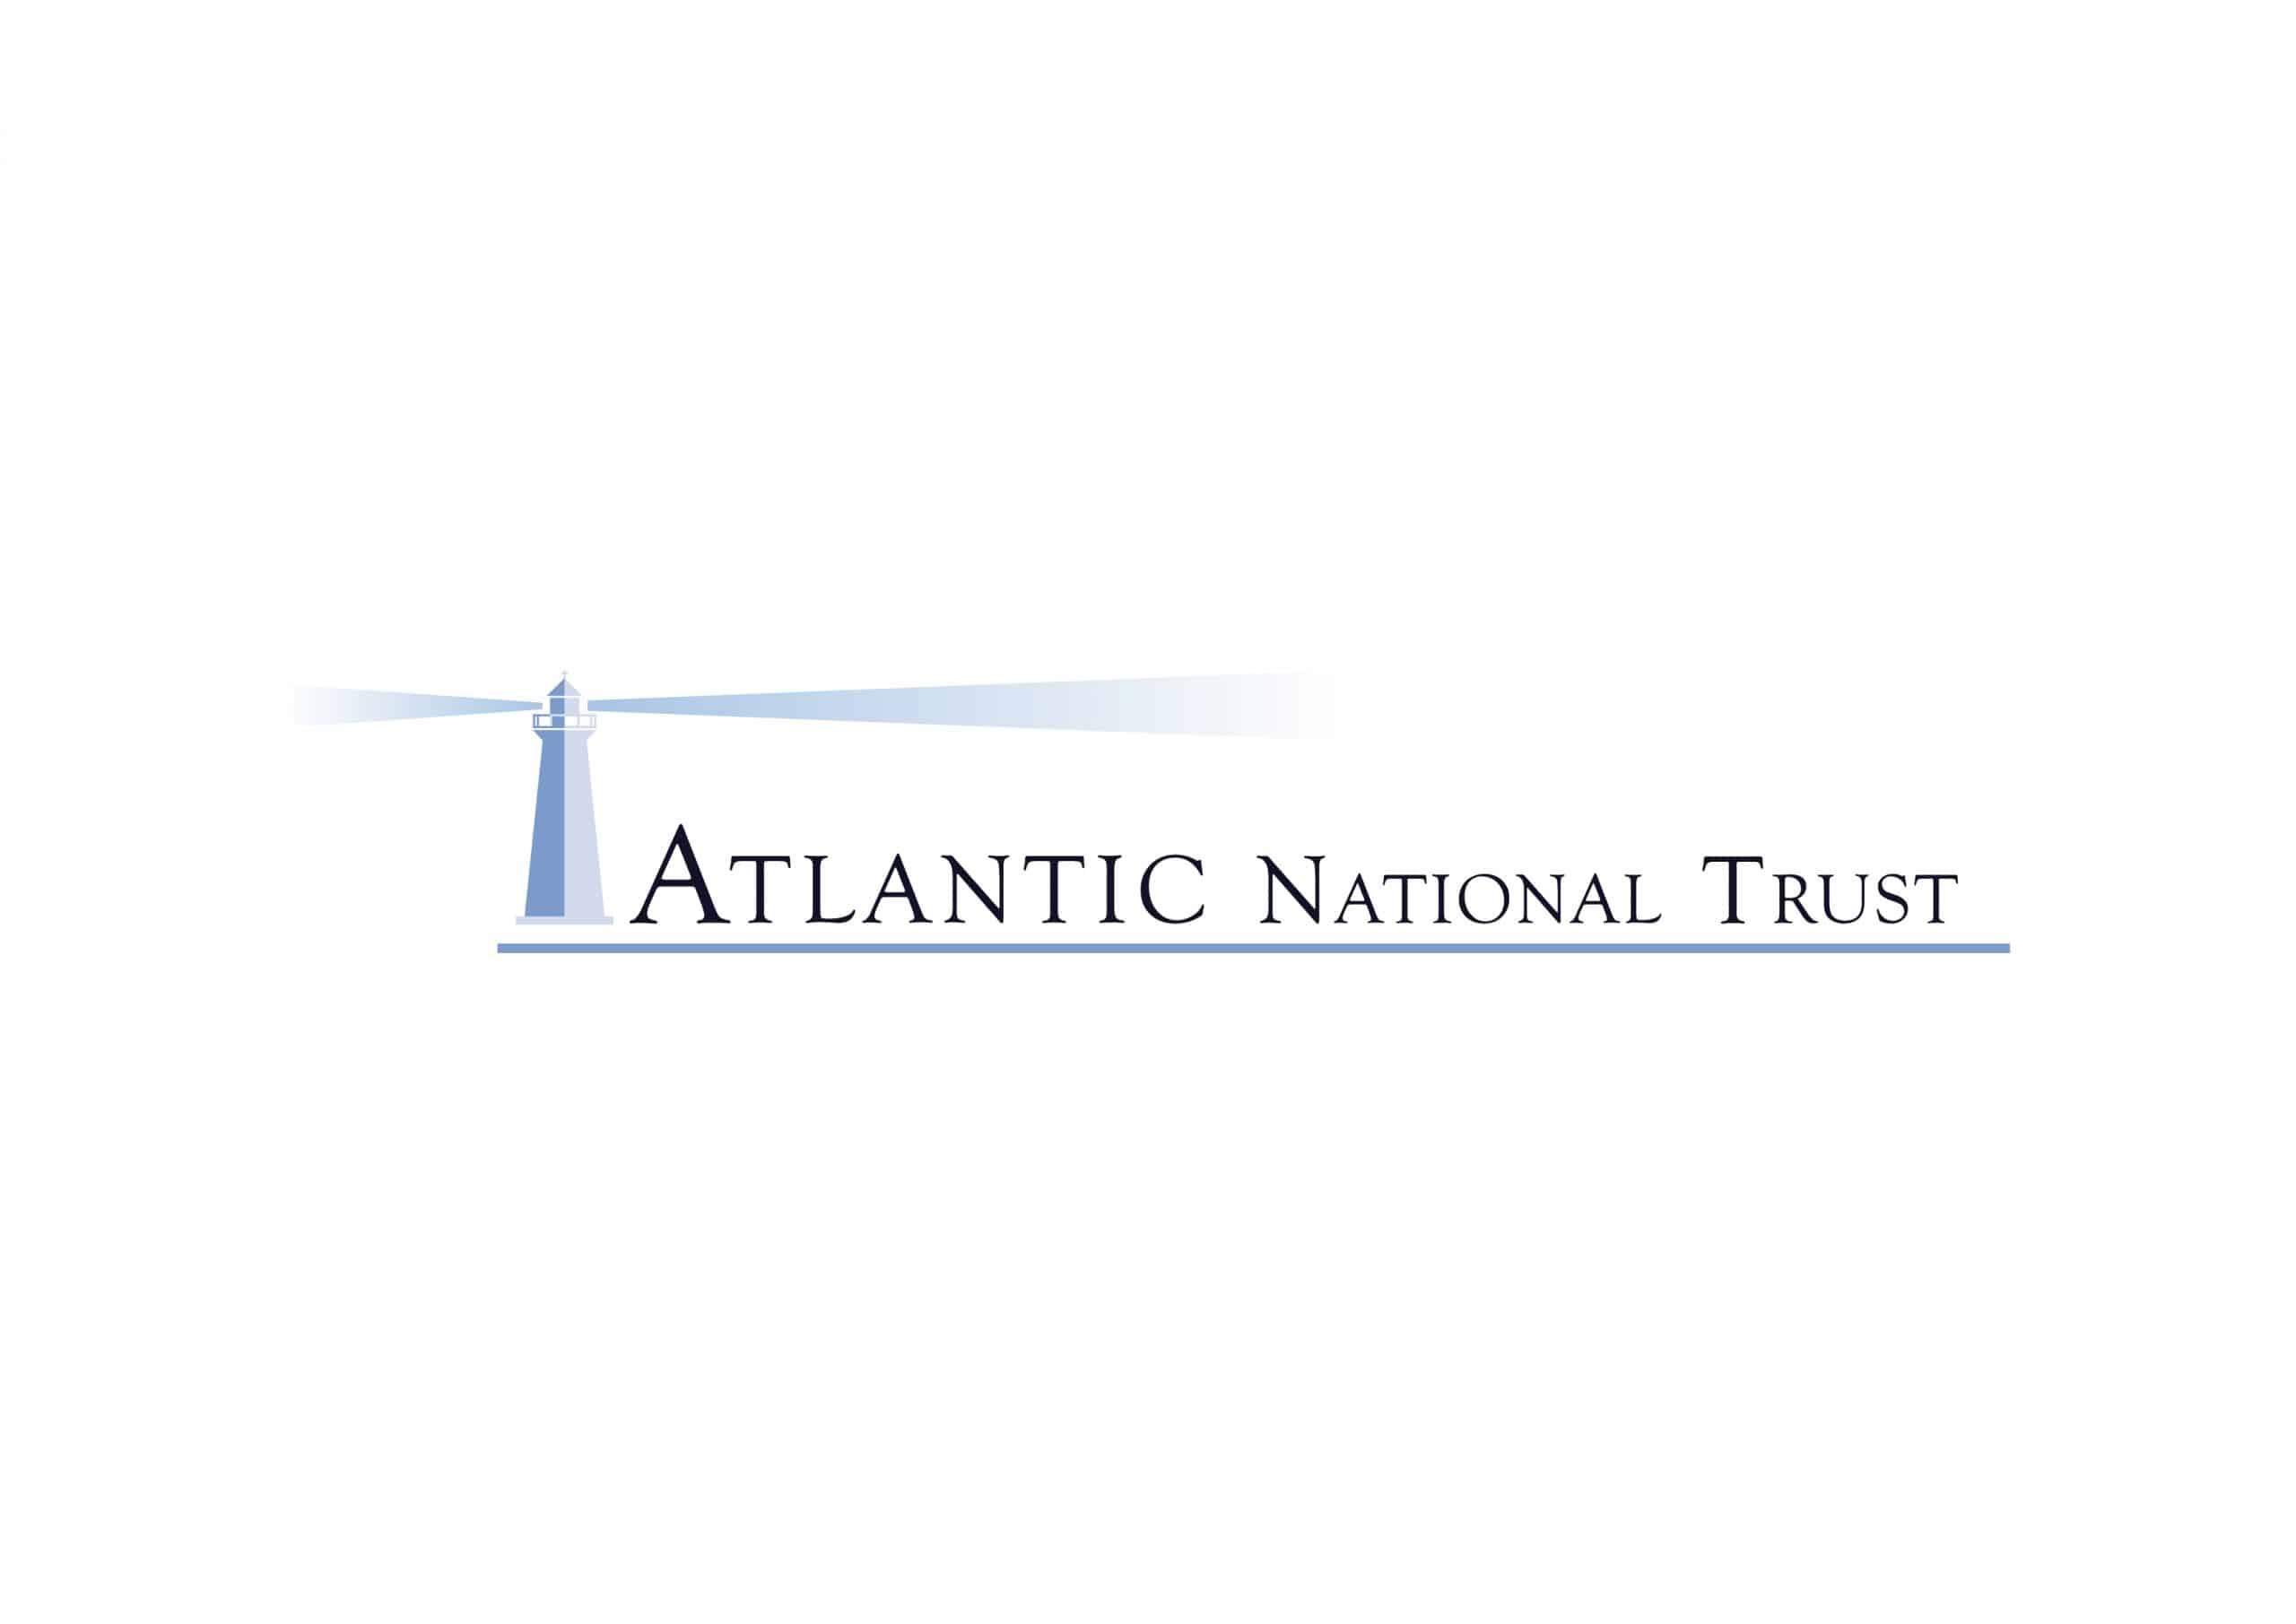 Atlantic National Trust